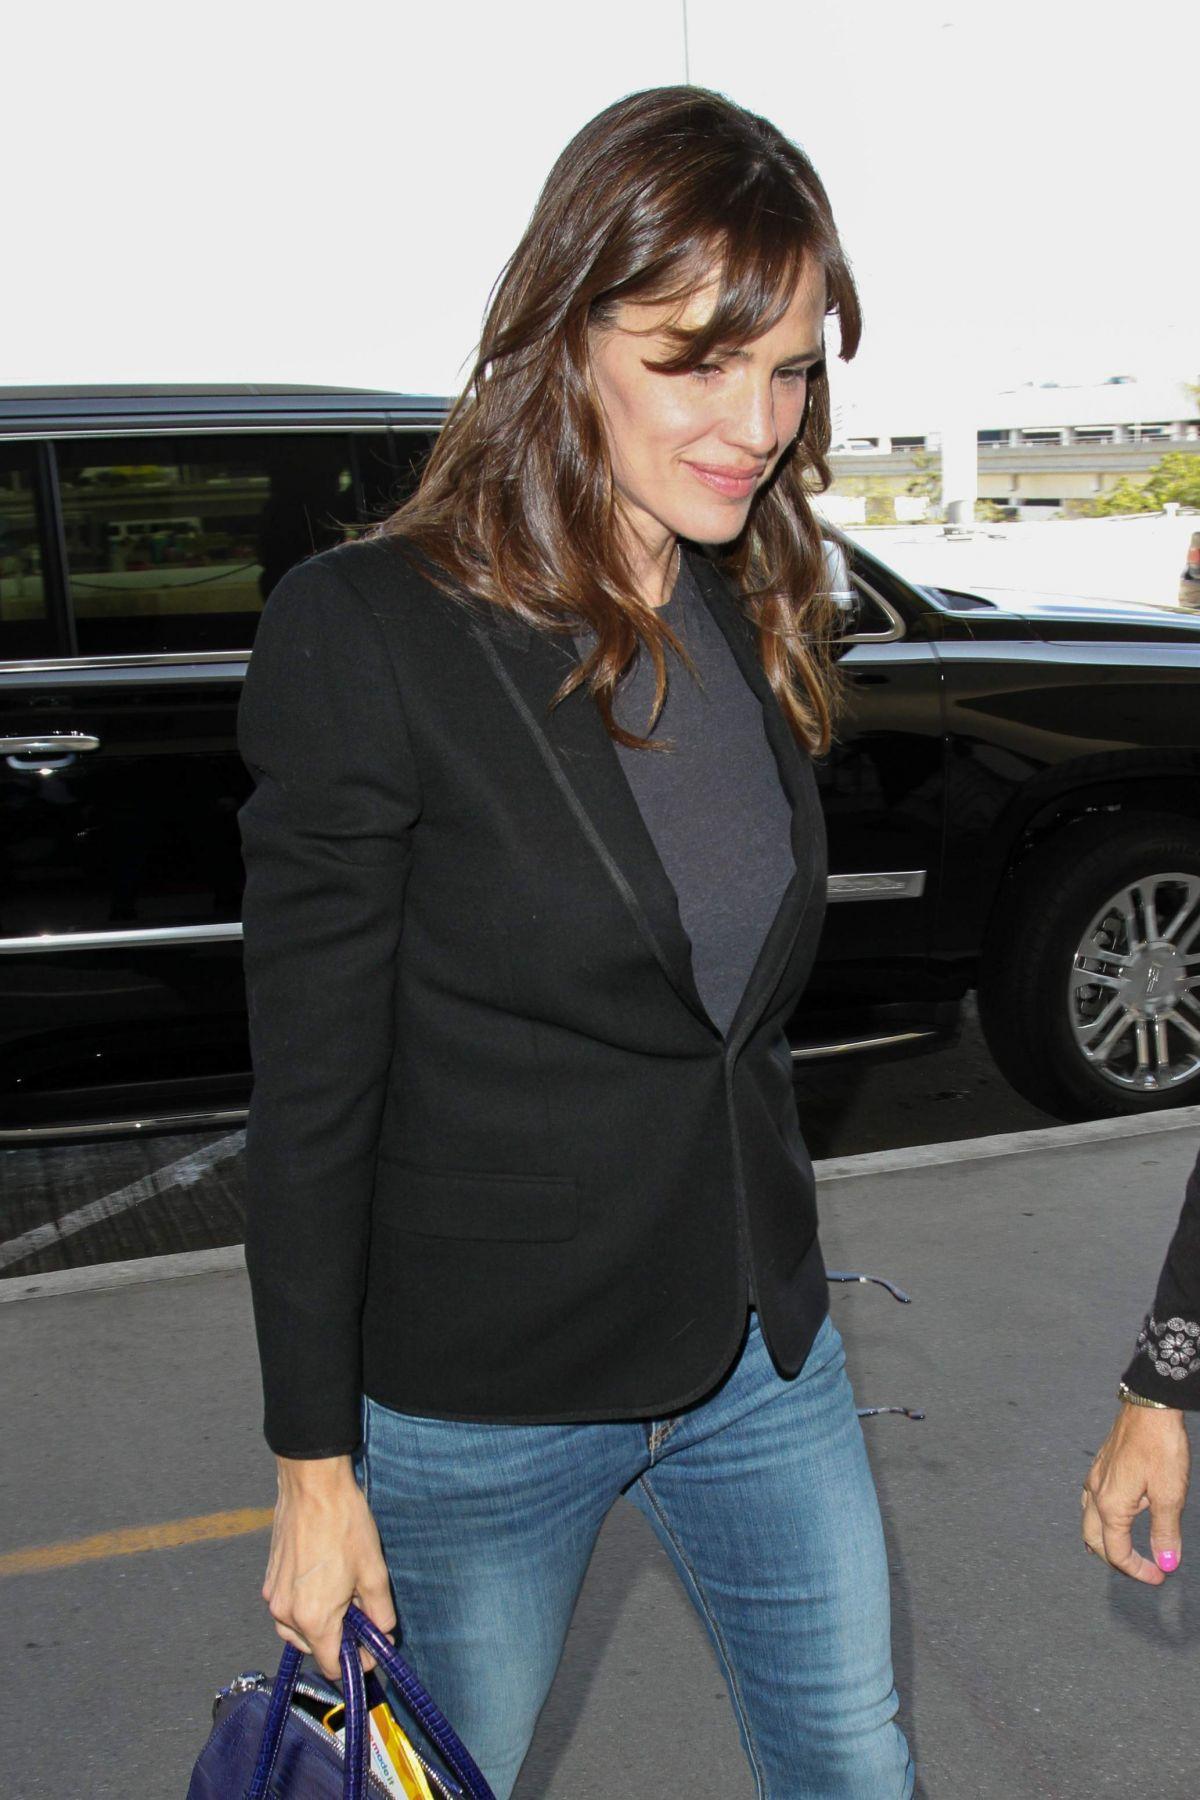 JENNIFER GARNER Arrives at LAX Airport in Los Angeles